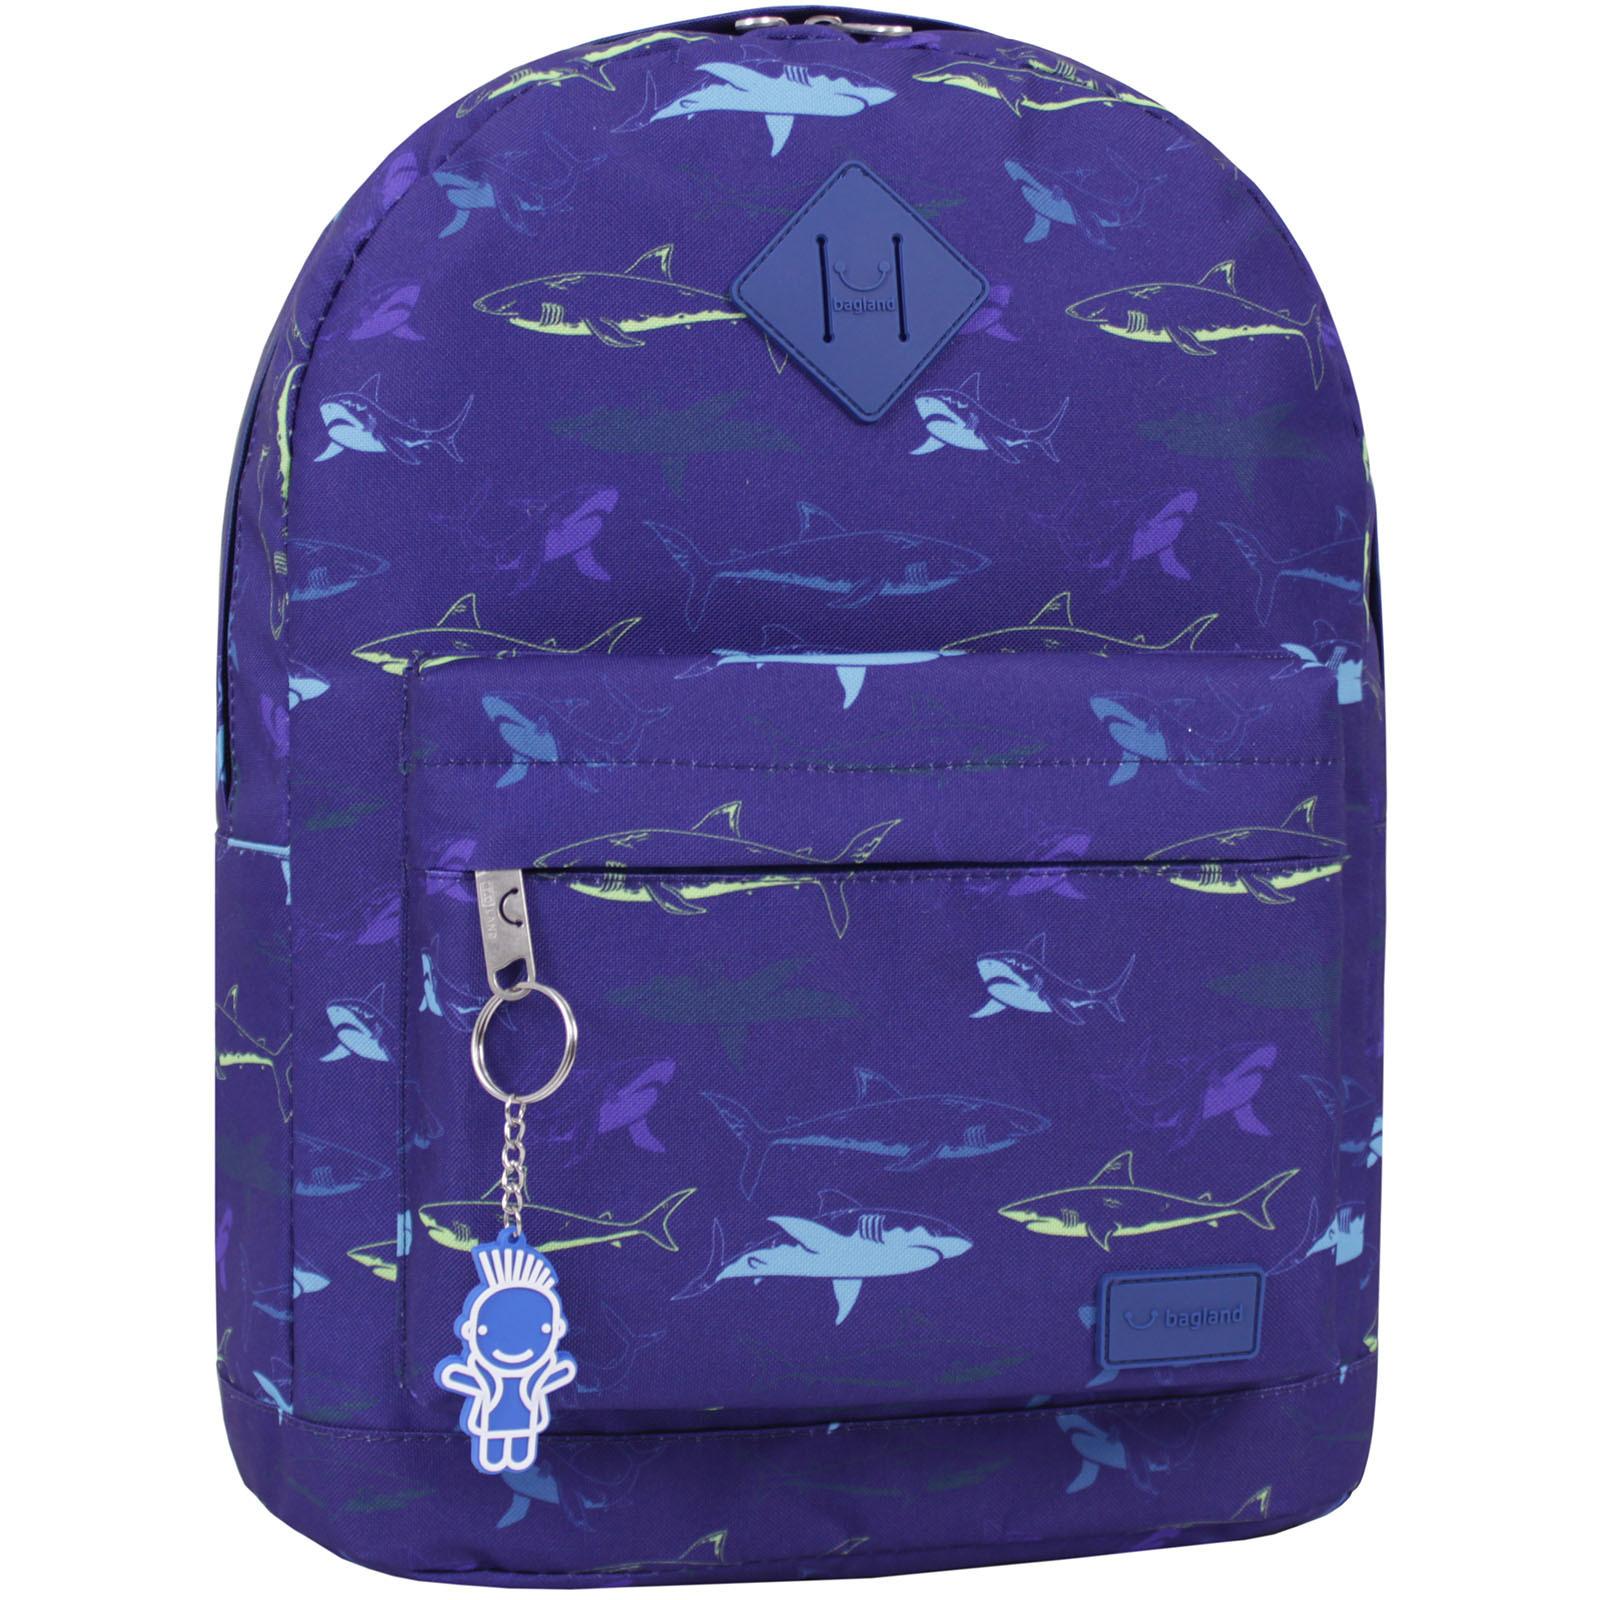 Молодежные рюкзаки Рюкзак Bagland Молодежный 17 л. сублимация 483 (00533664) IMG_9360_суб.483_.JPG